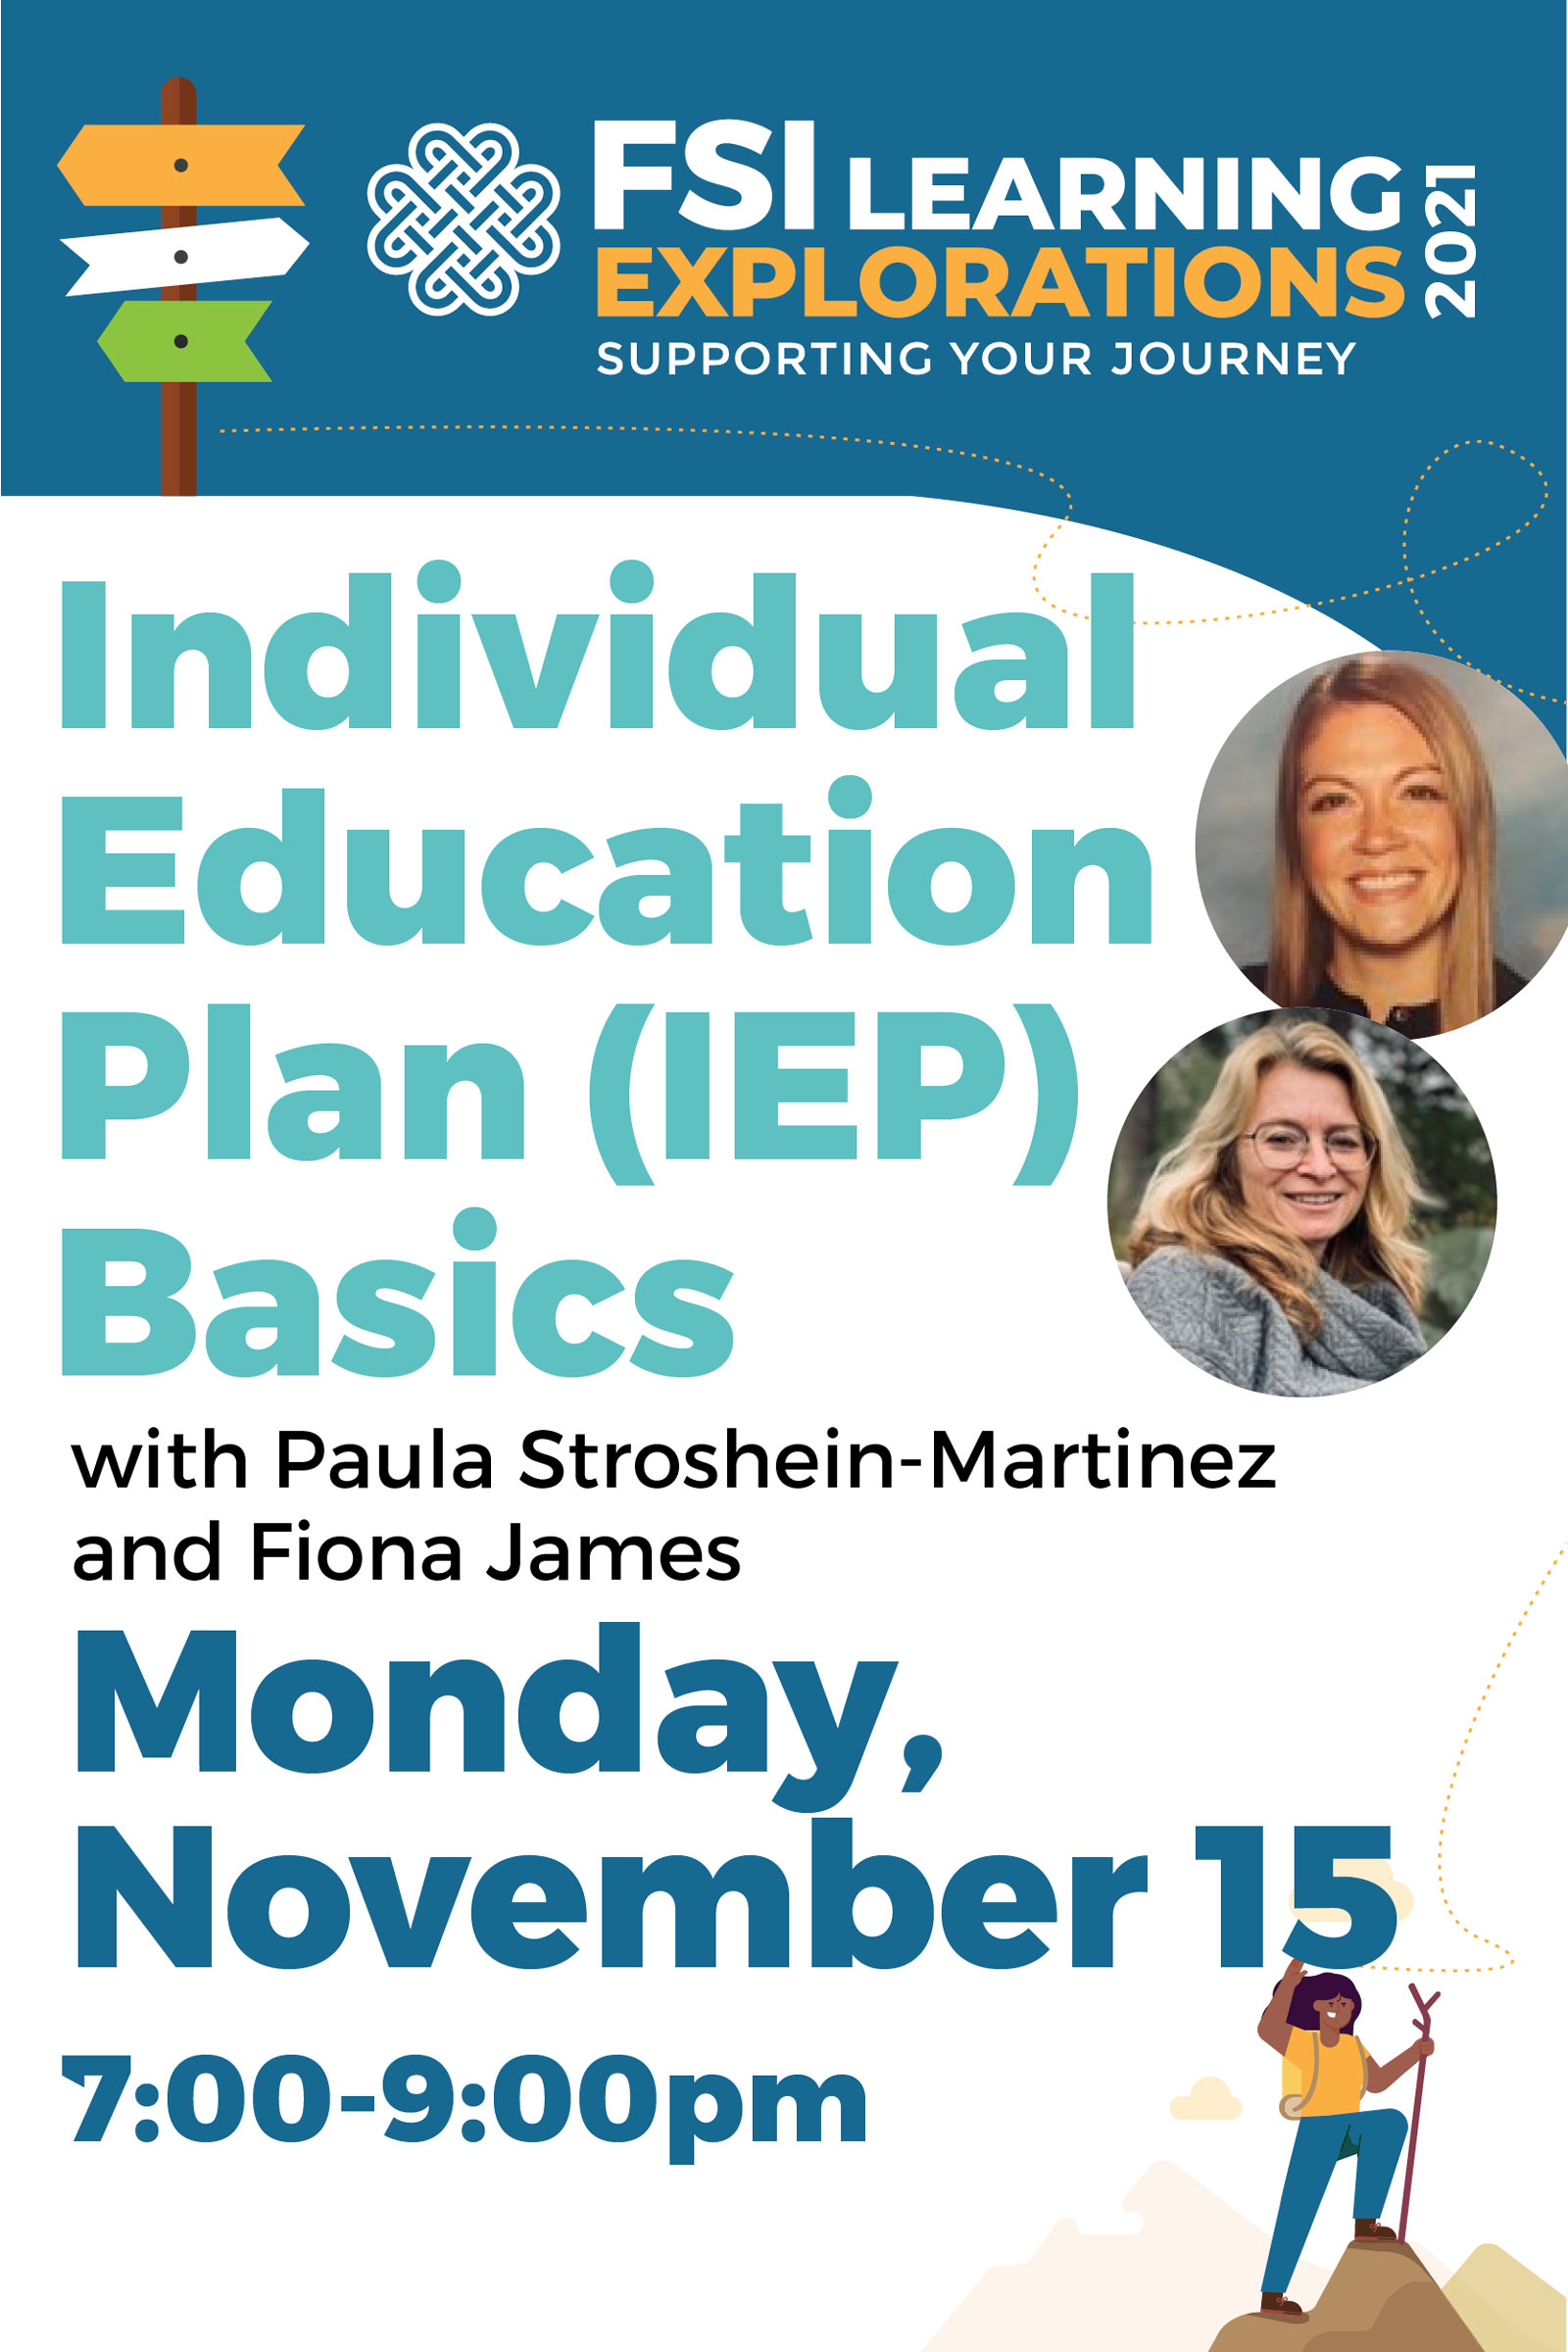 FSI Learning Explorations ~ Individual Education Plan (IEP) Basics